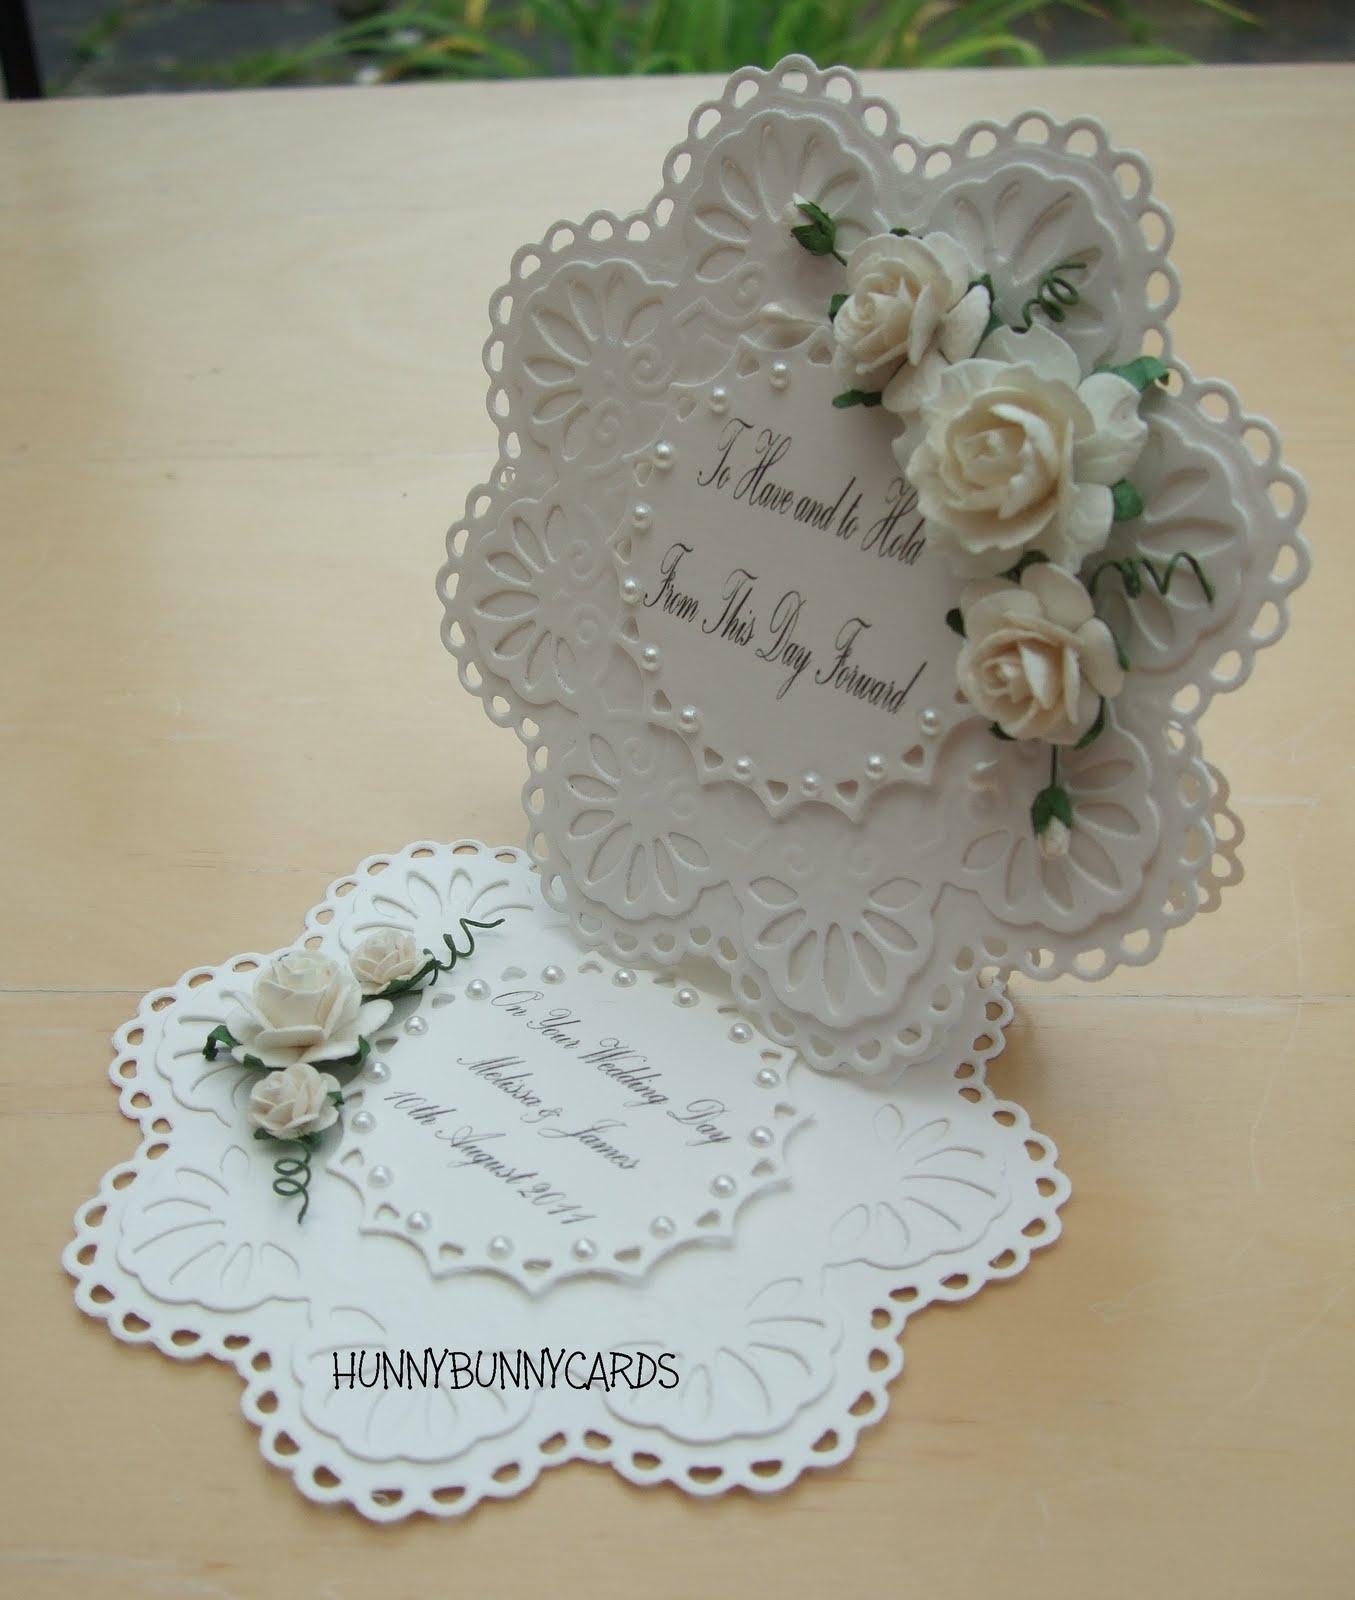 http://4.bp.blogspot.com/-IzGK7t4POu4/Tk1p4YHu9QI/AAAAAAAACoI/Z973wHEMssI/s1600/marianne+wedding2.JPG